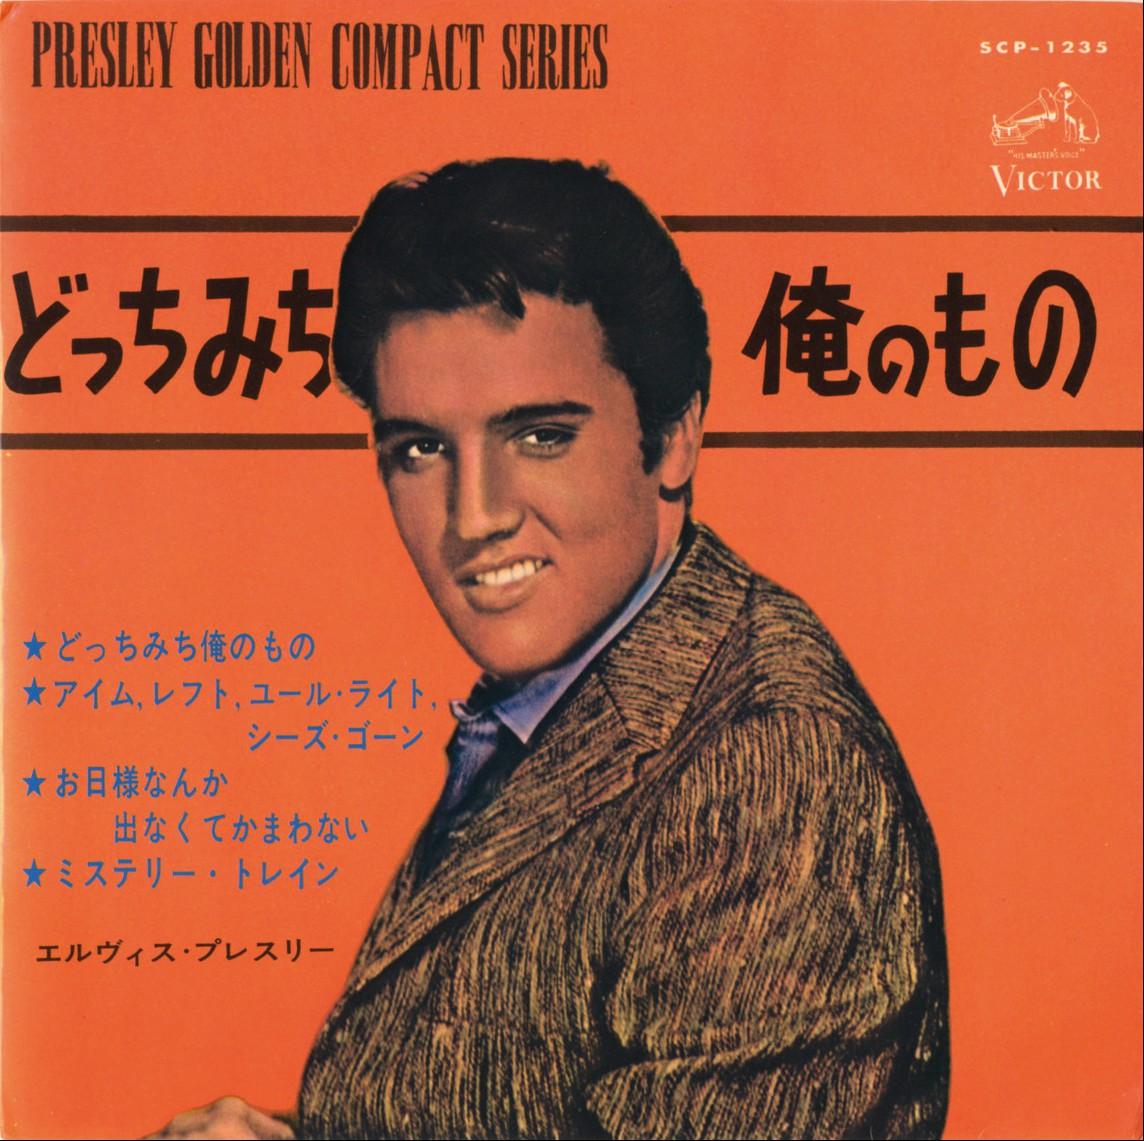 Diskografie Japan 1955 - 1977 Scp-123593sey